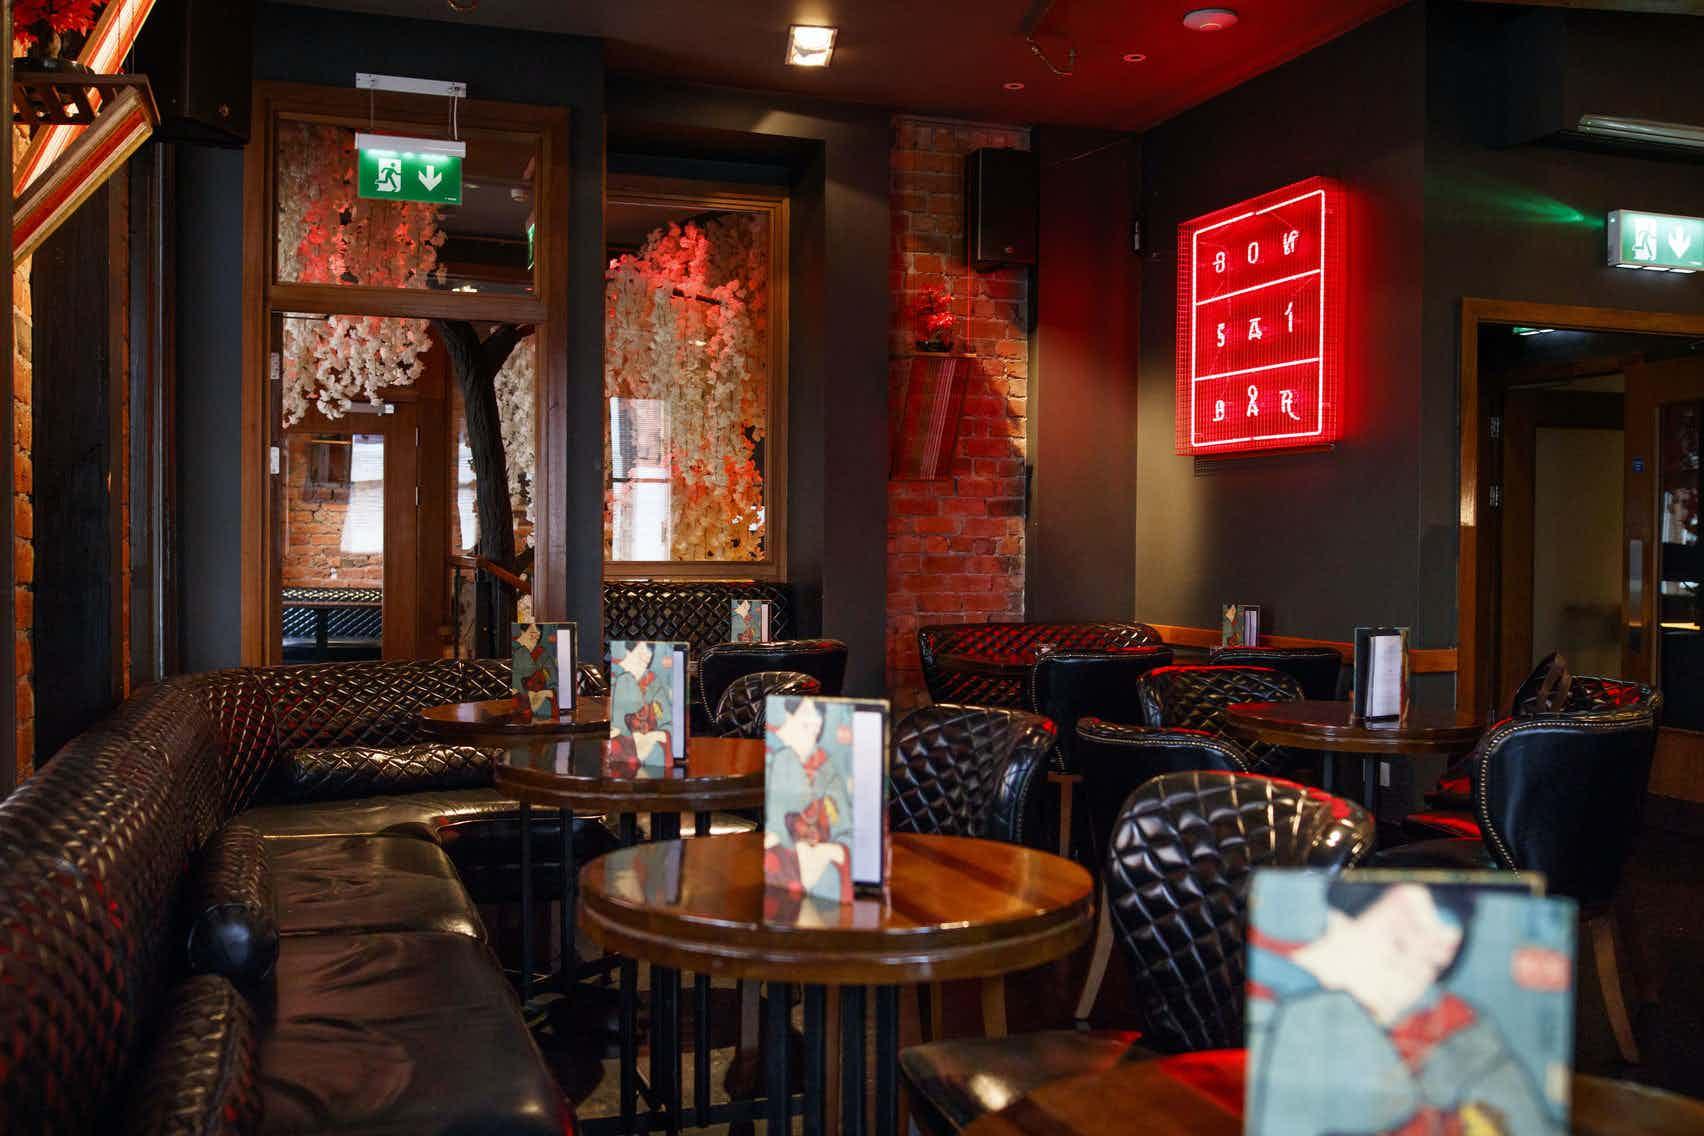 Entire Venue, The Bonsai Bar